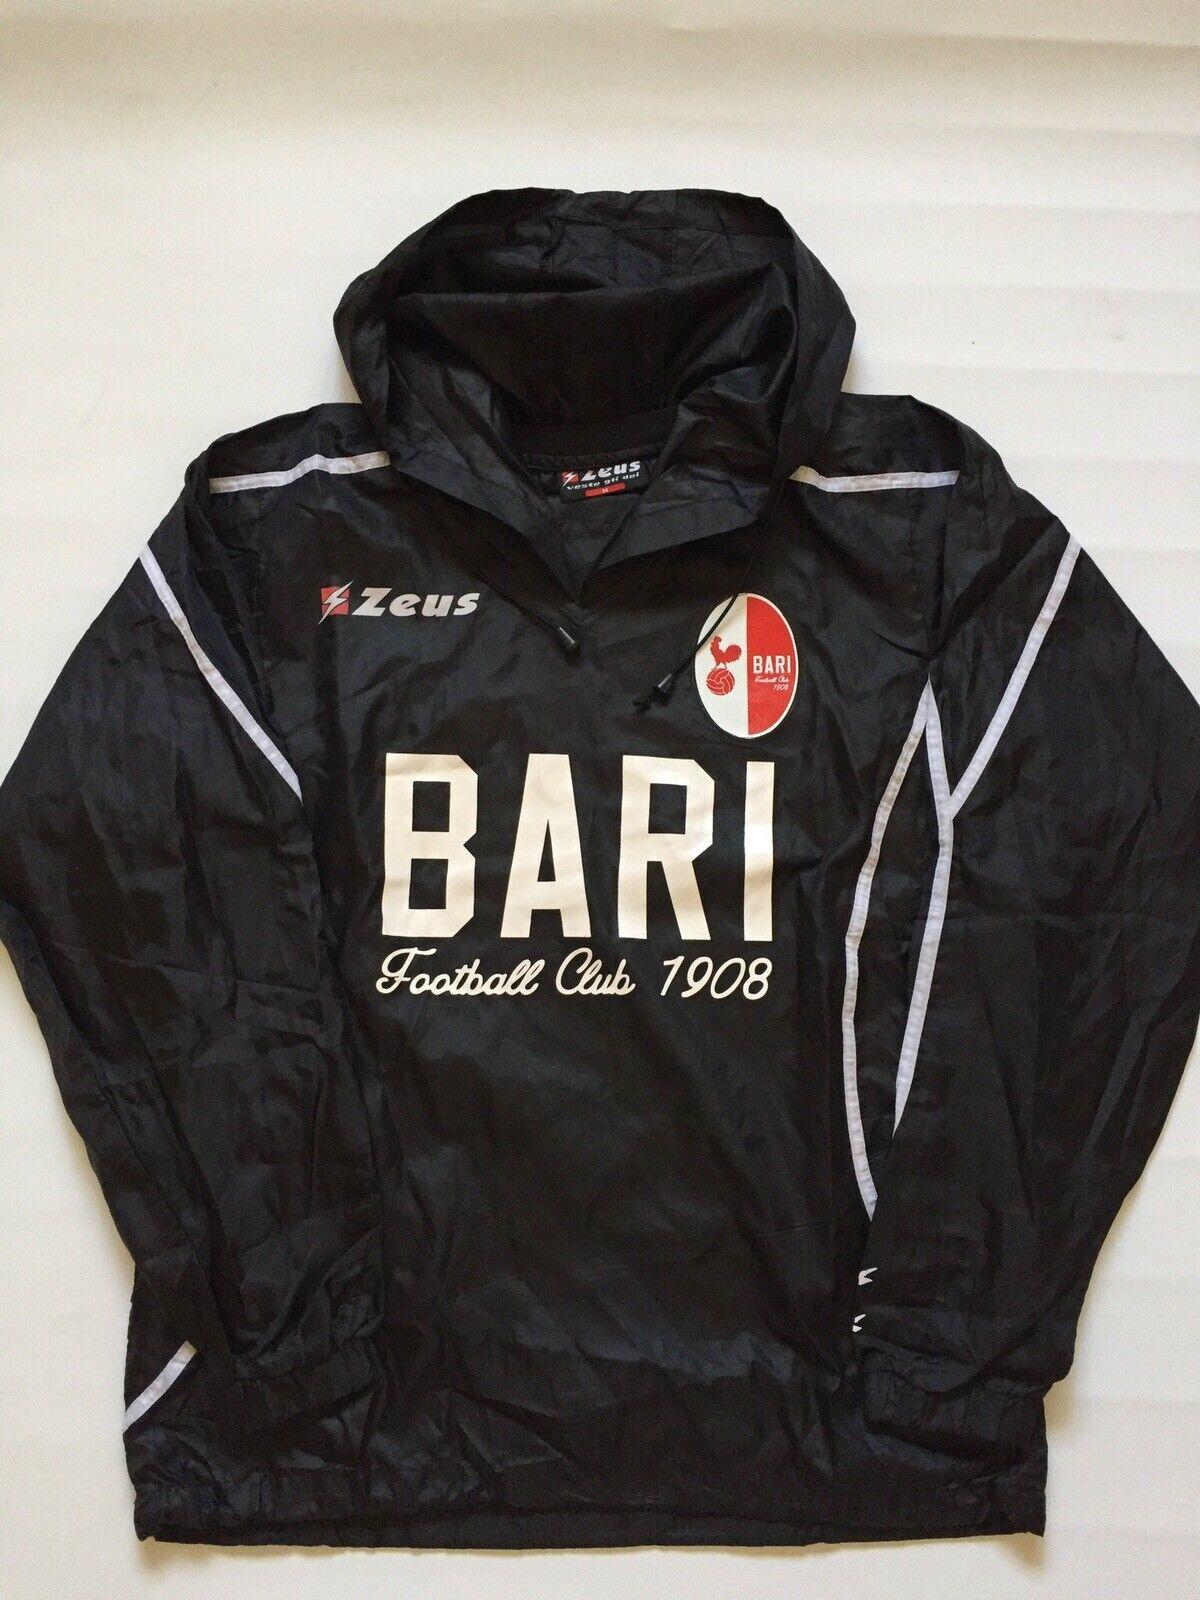 Kway FC BARI 1908. Zeus. Serie B. No Maglia Bari Calcio.